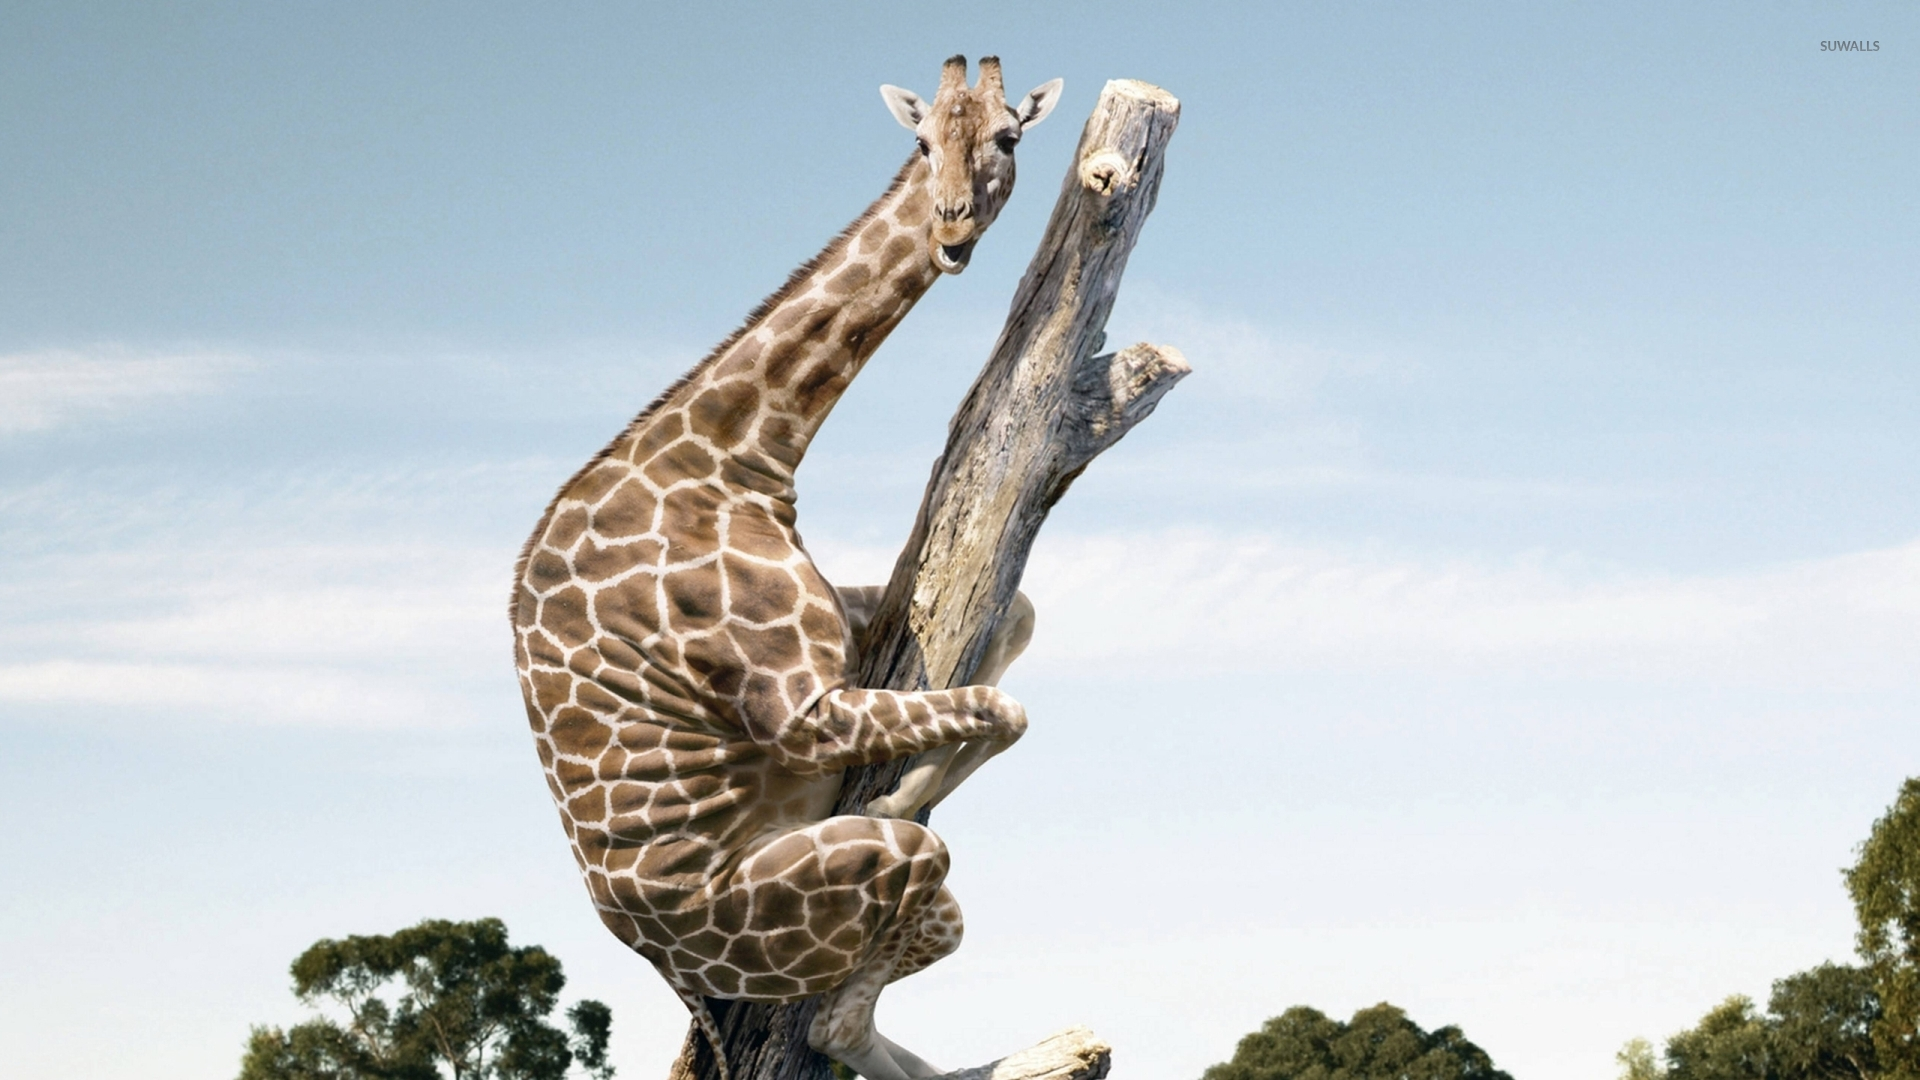 Crossfit Wallpaper Girls Giraffe On A Tree Trunk Wallpaper Funny Wallpapers 42410